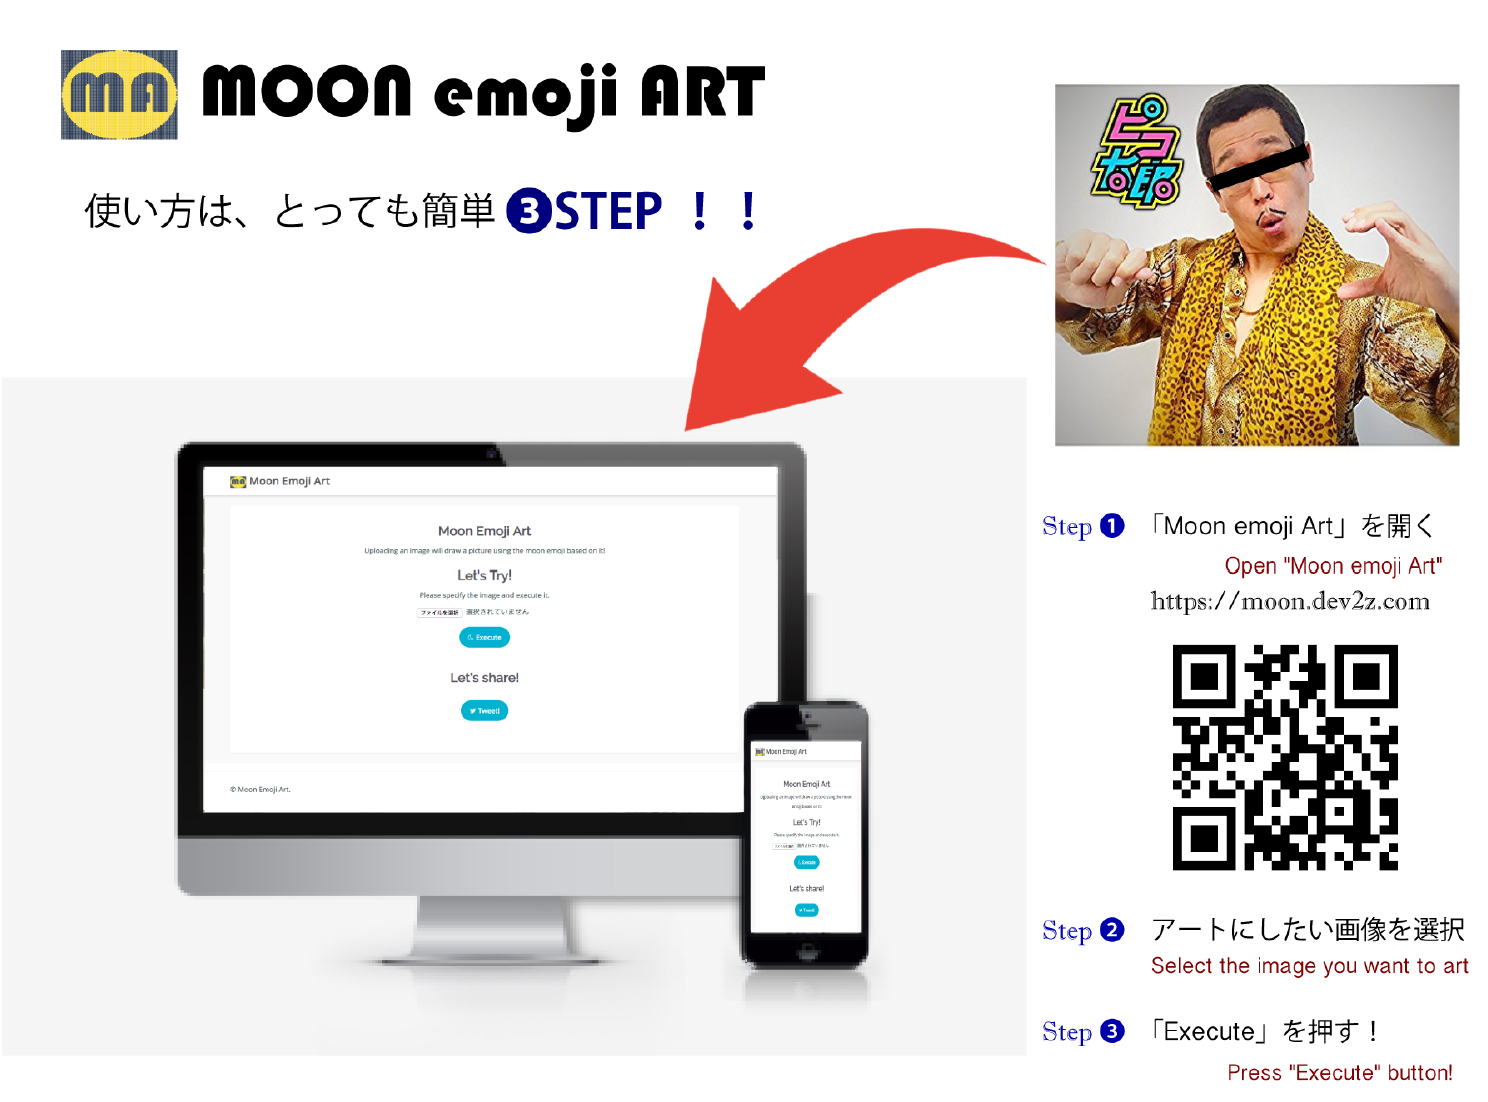 moon_emoji_art-2.png